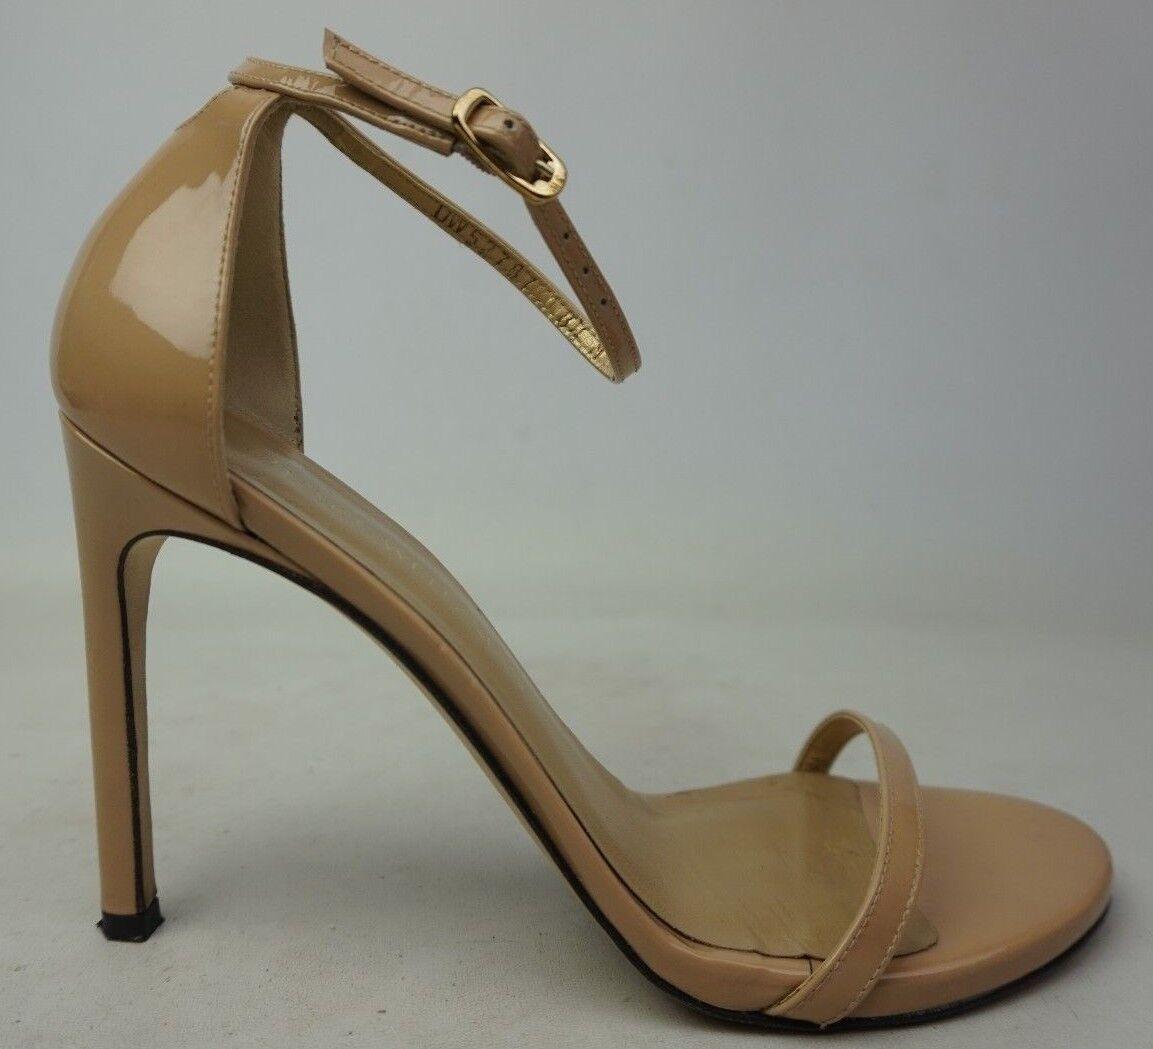 i nuovi marchi outlet online Stuart Weitzman Nudistsong Ankle Strap Adobe Aniline Aniline Aniline Patent Heel Sandal Dimensione 8.5  sconto